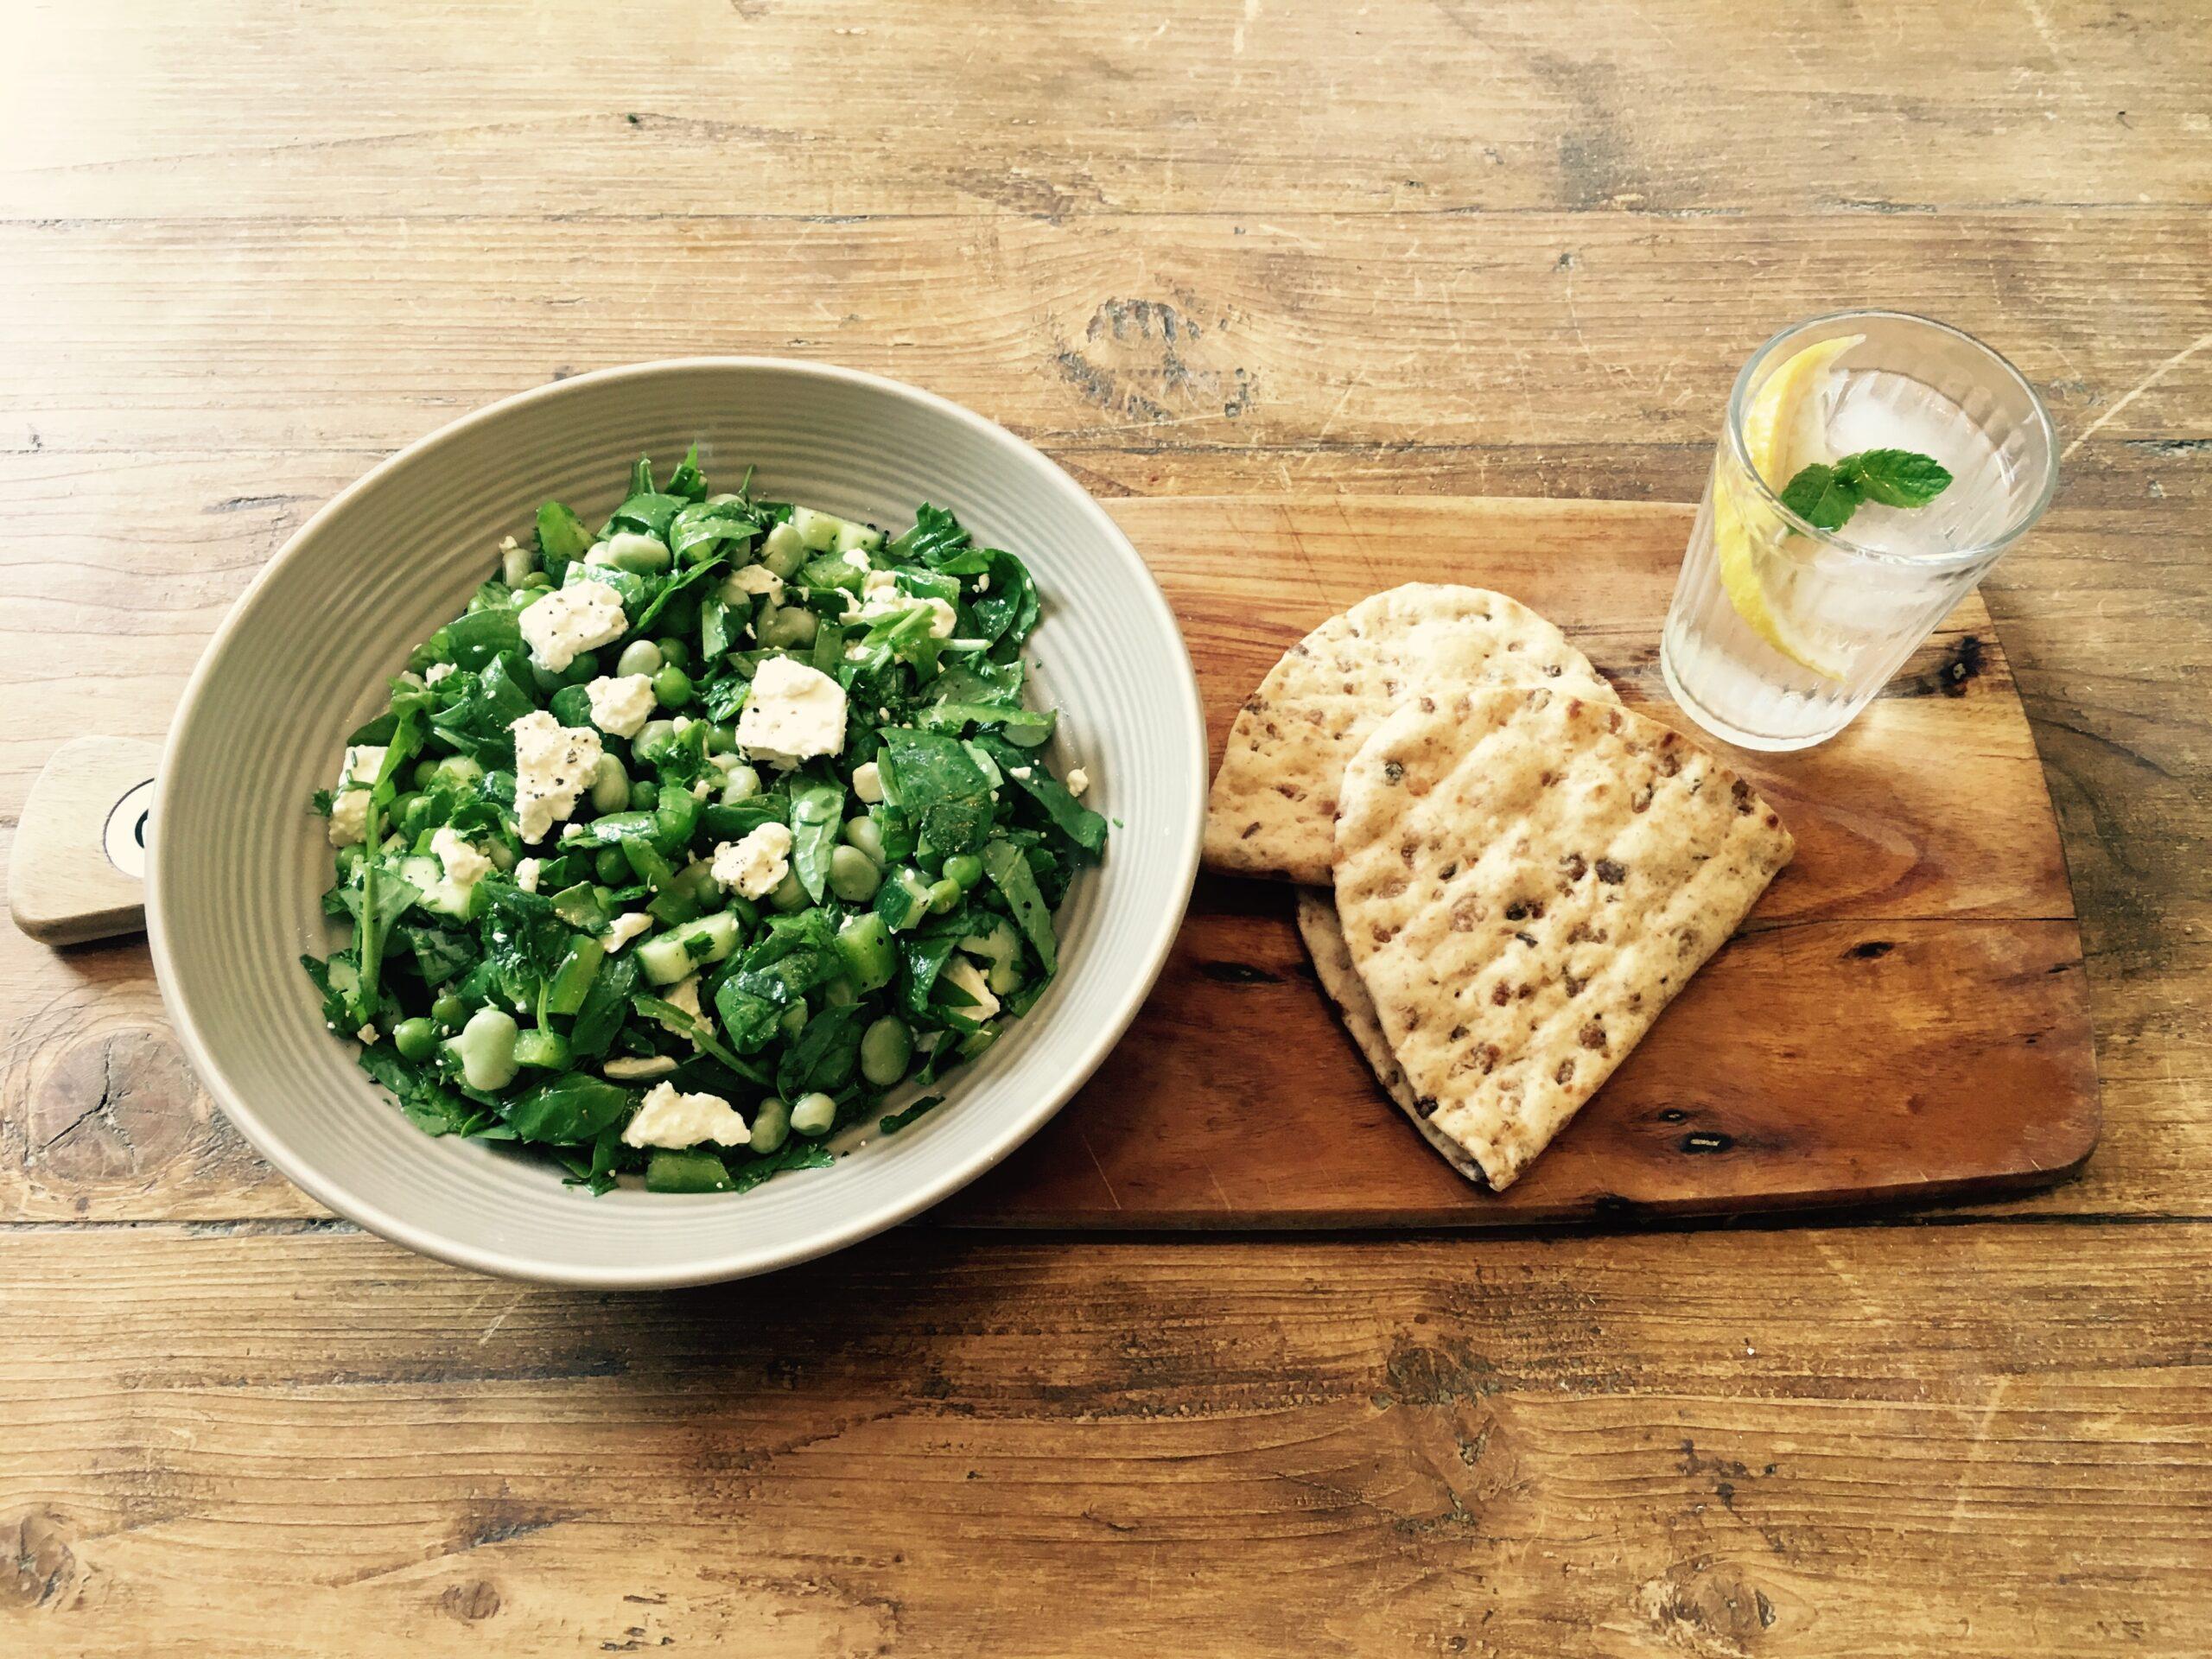 Zesty Feta and Summer Green Salad